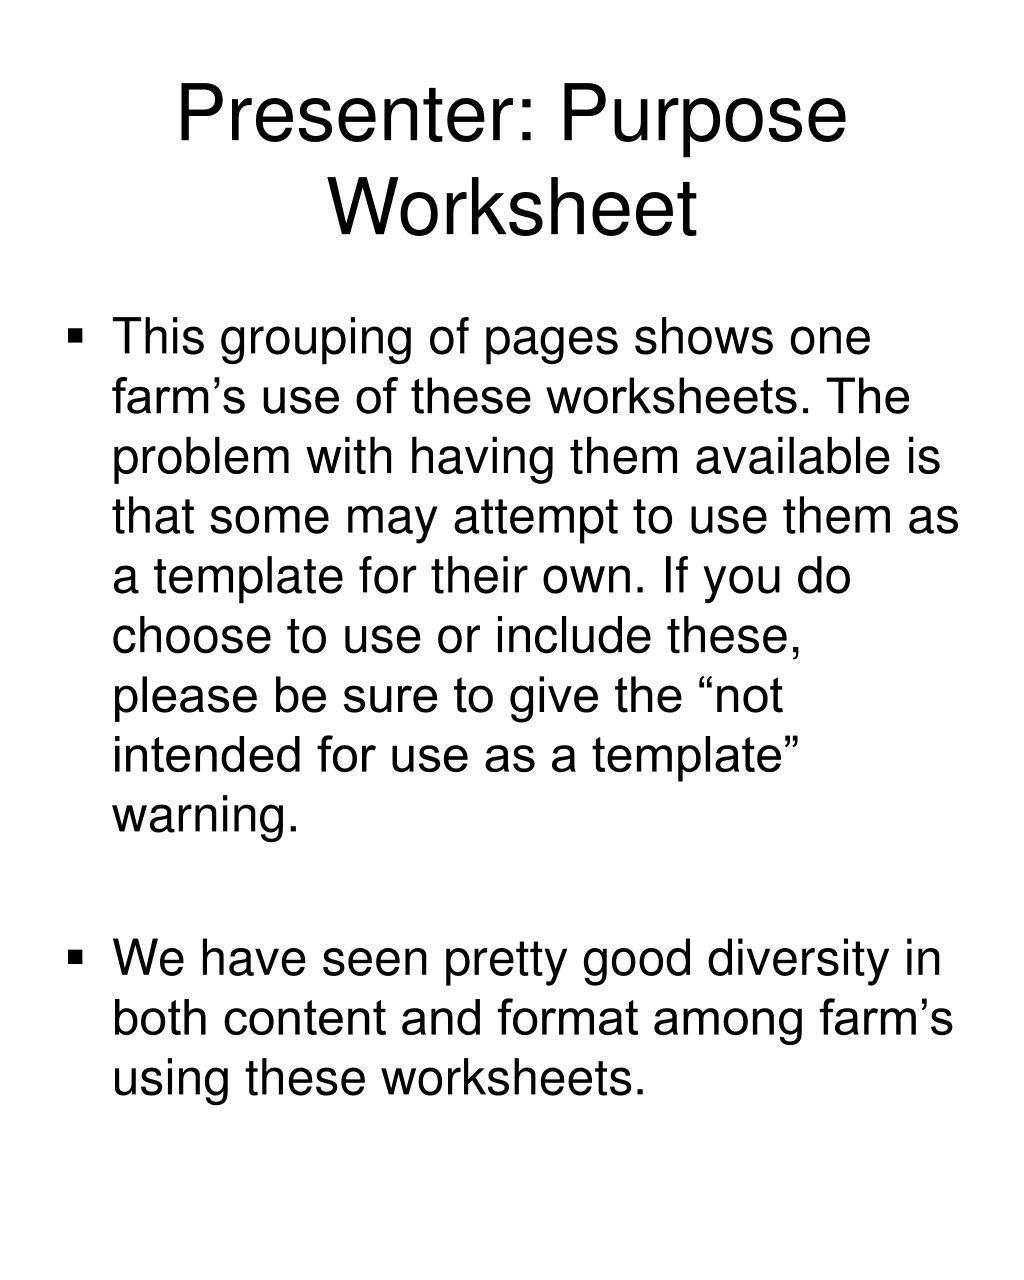 Presenter: Purpose Worksheet